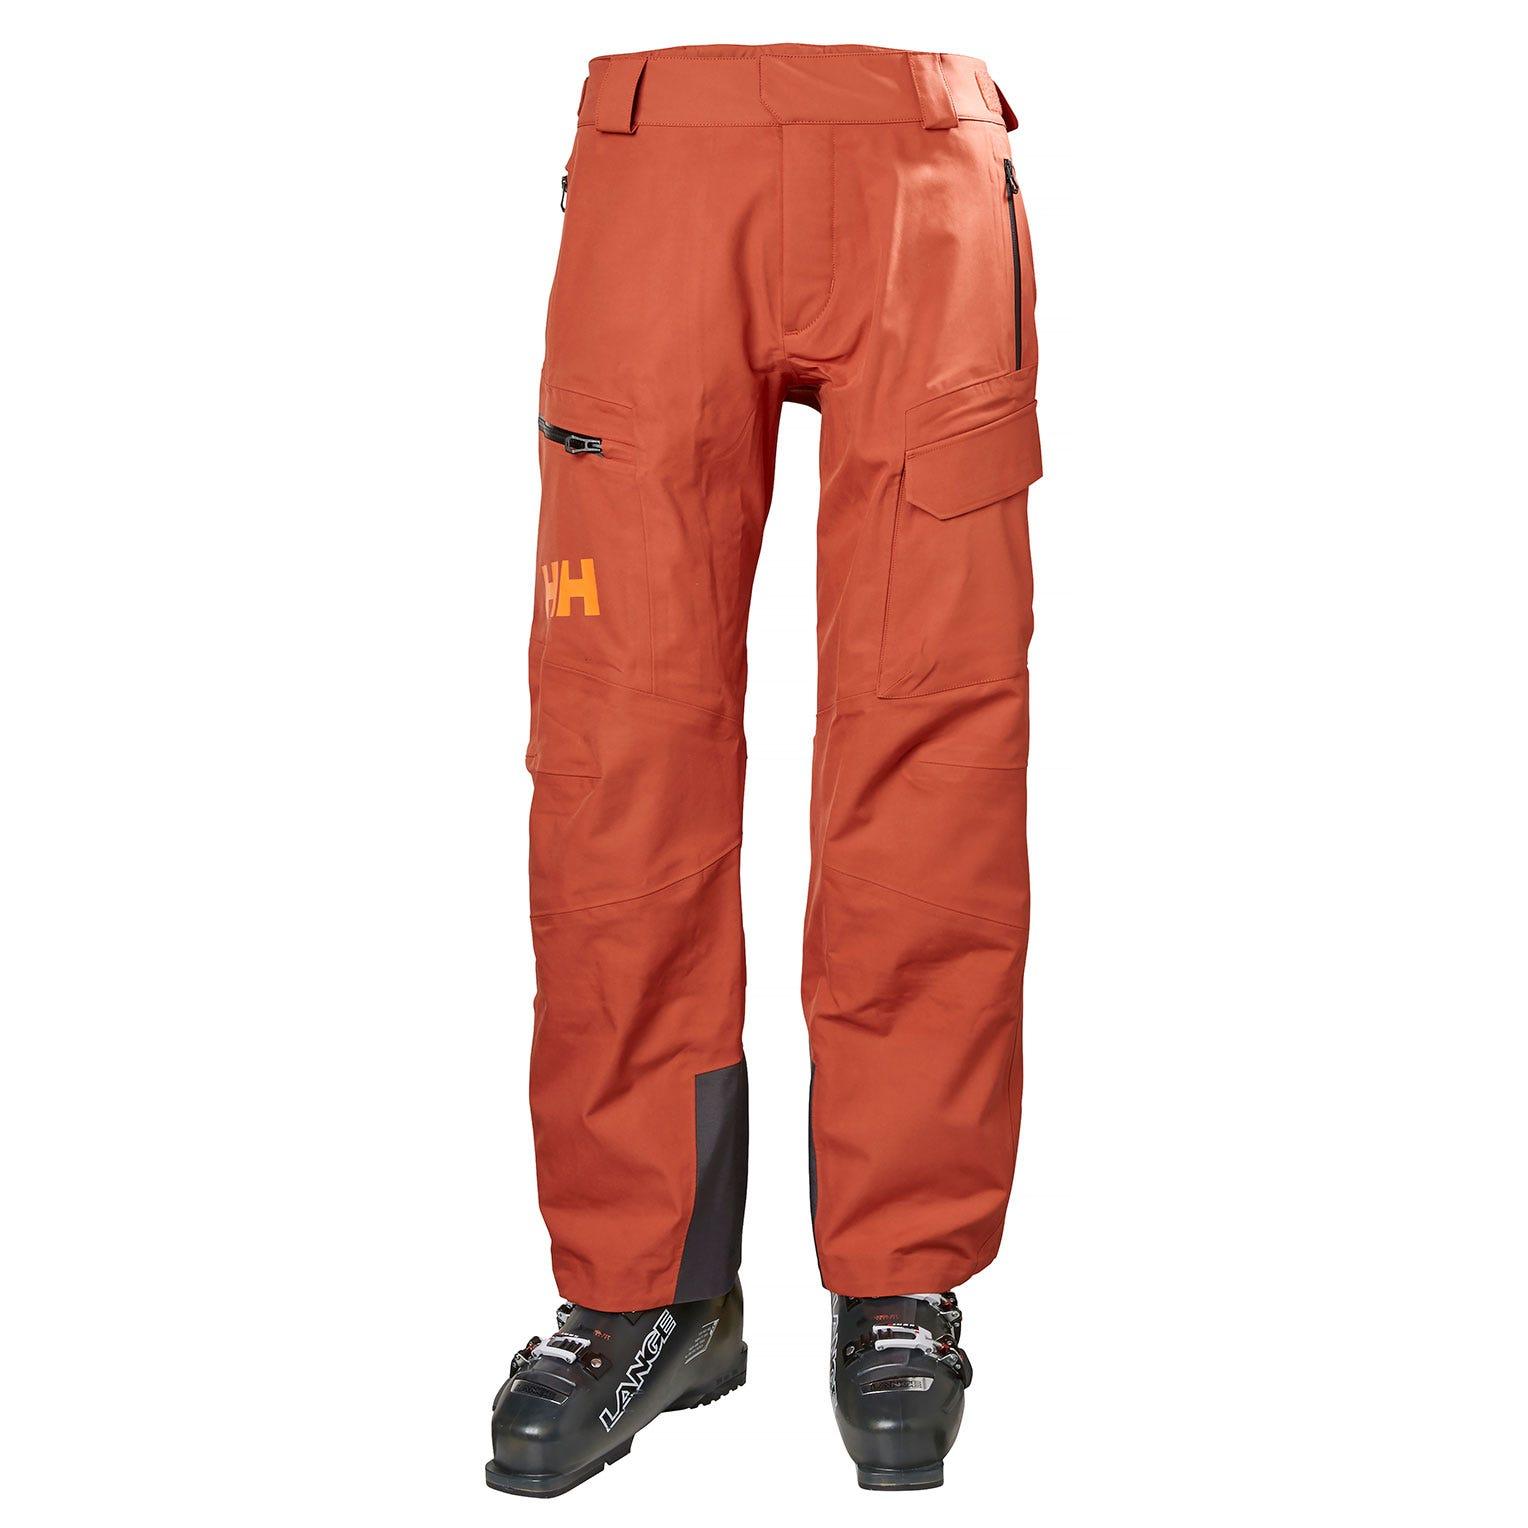 Helly Hansen Ridge Shell Pant Mens Ski Red XXL